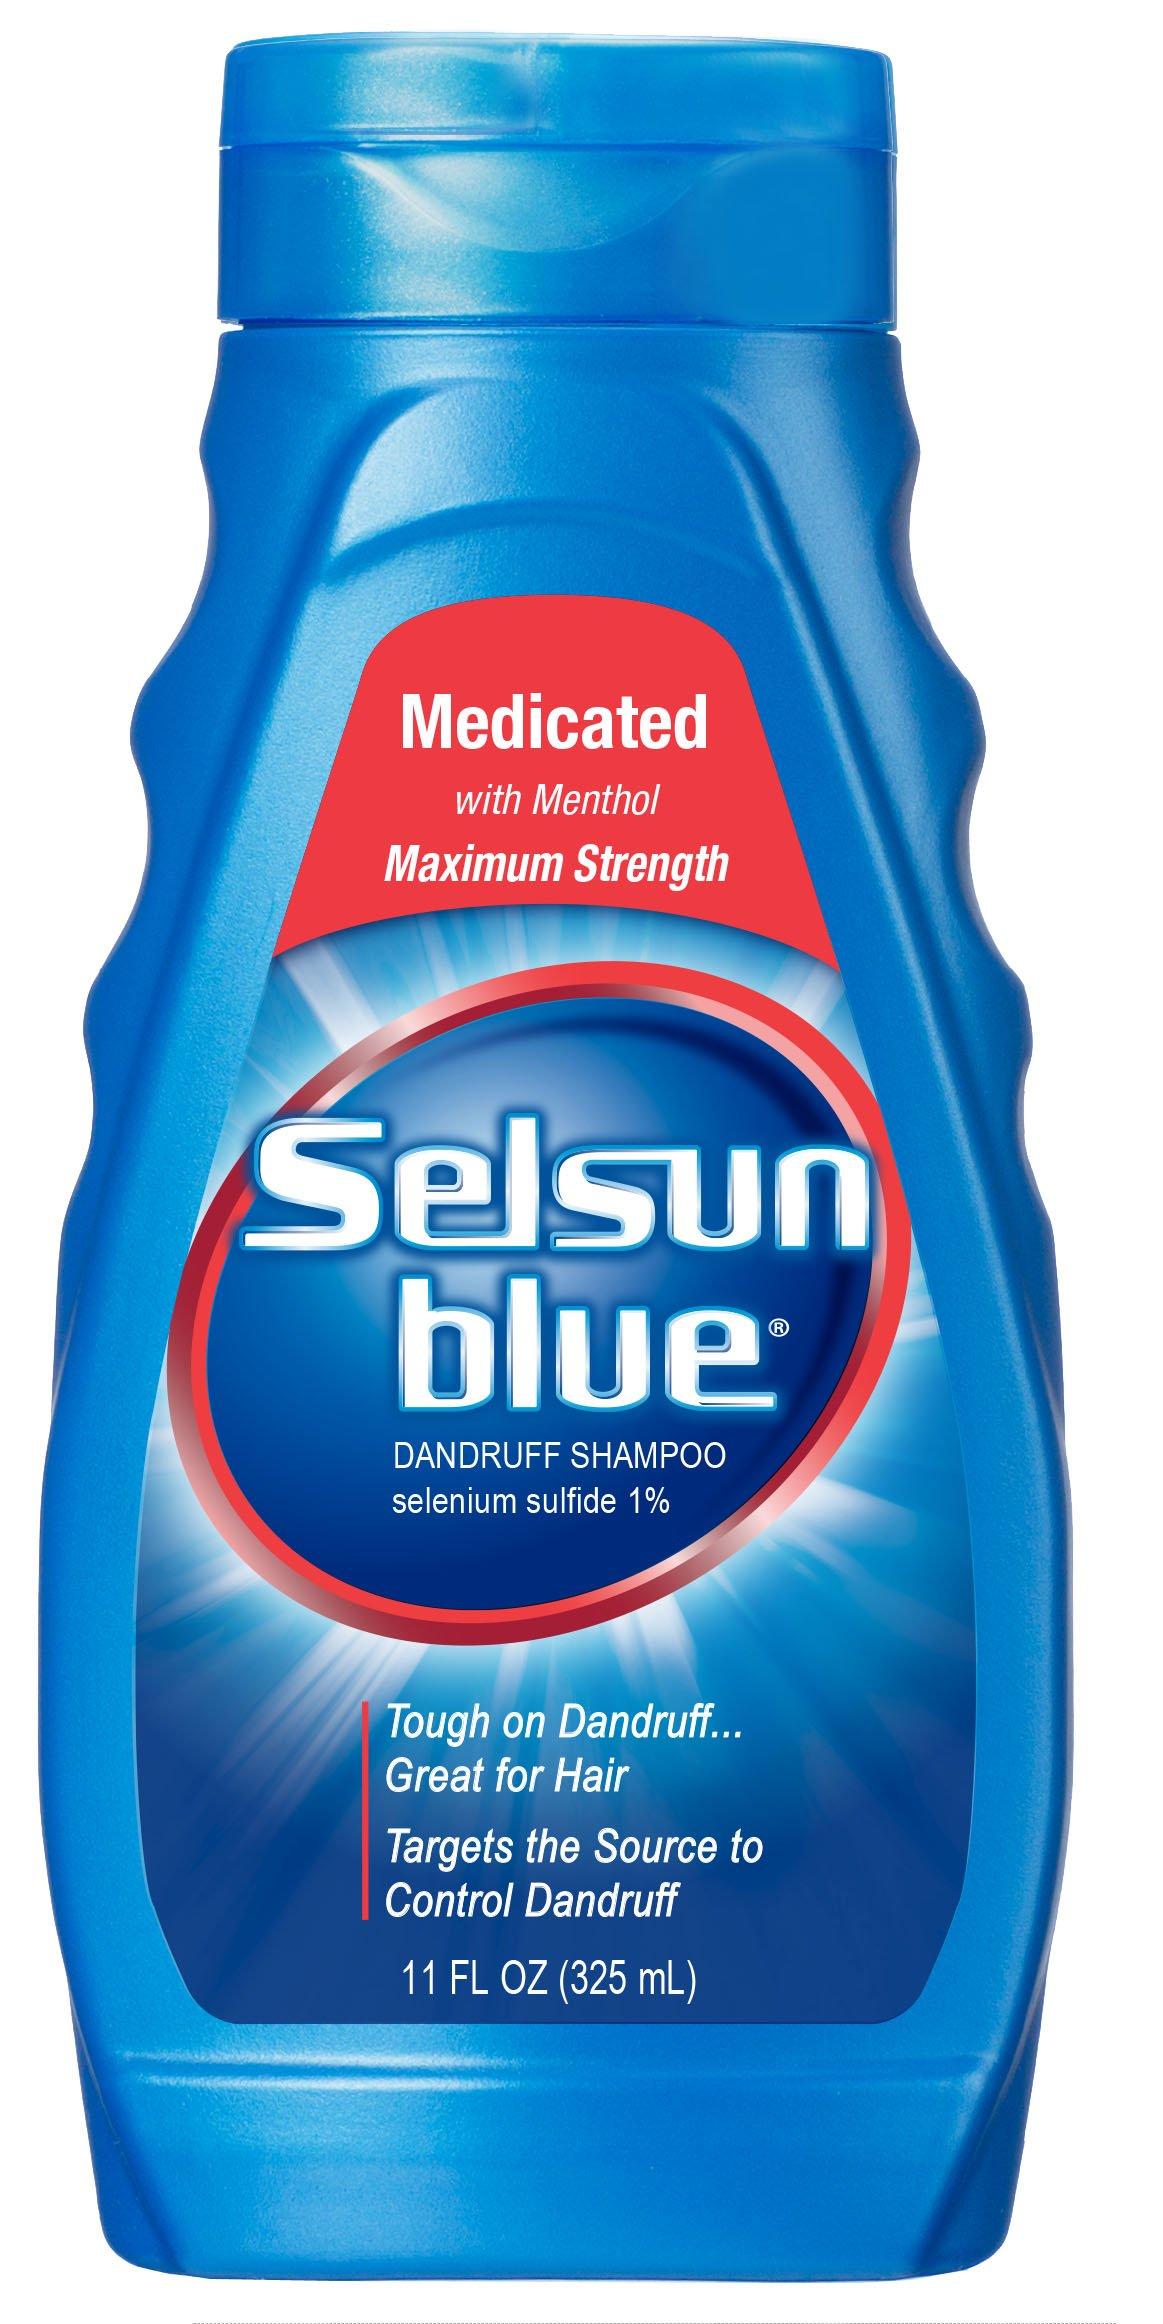 Selsun Blue Medicated Dandruff Shampoo 11 Fl Oz Bottles (Pack of 3)